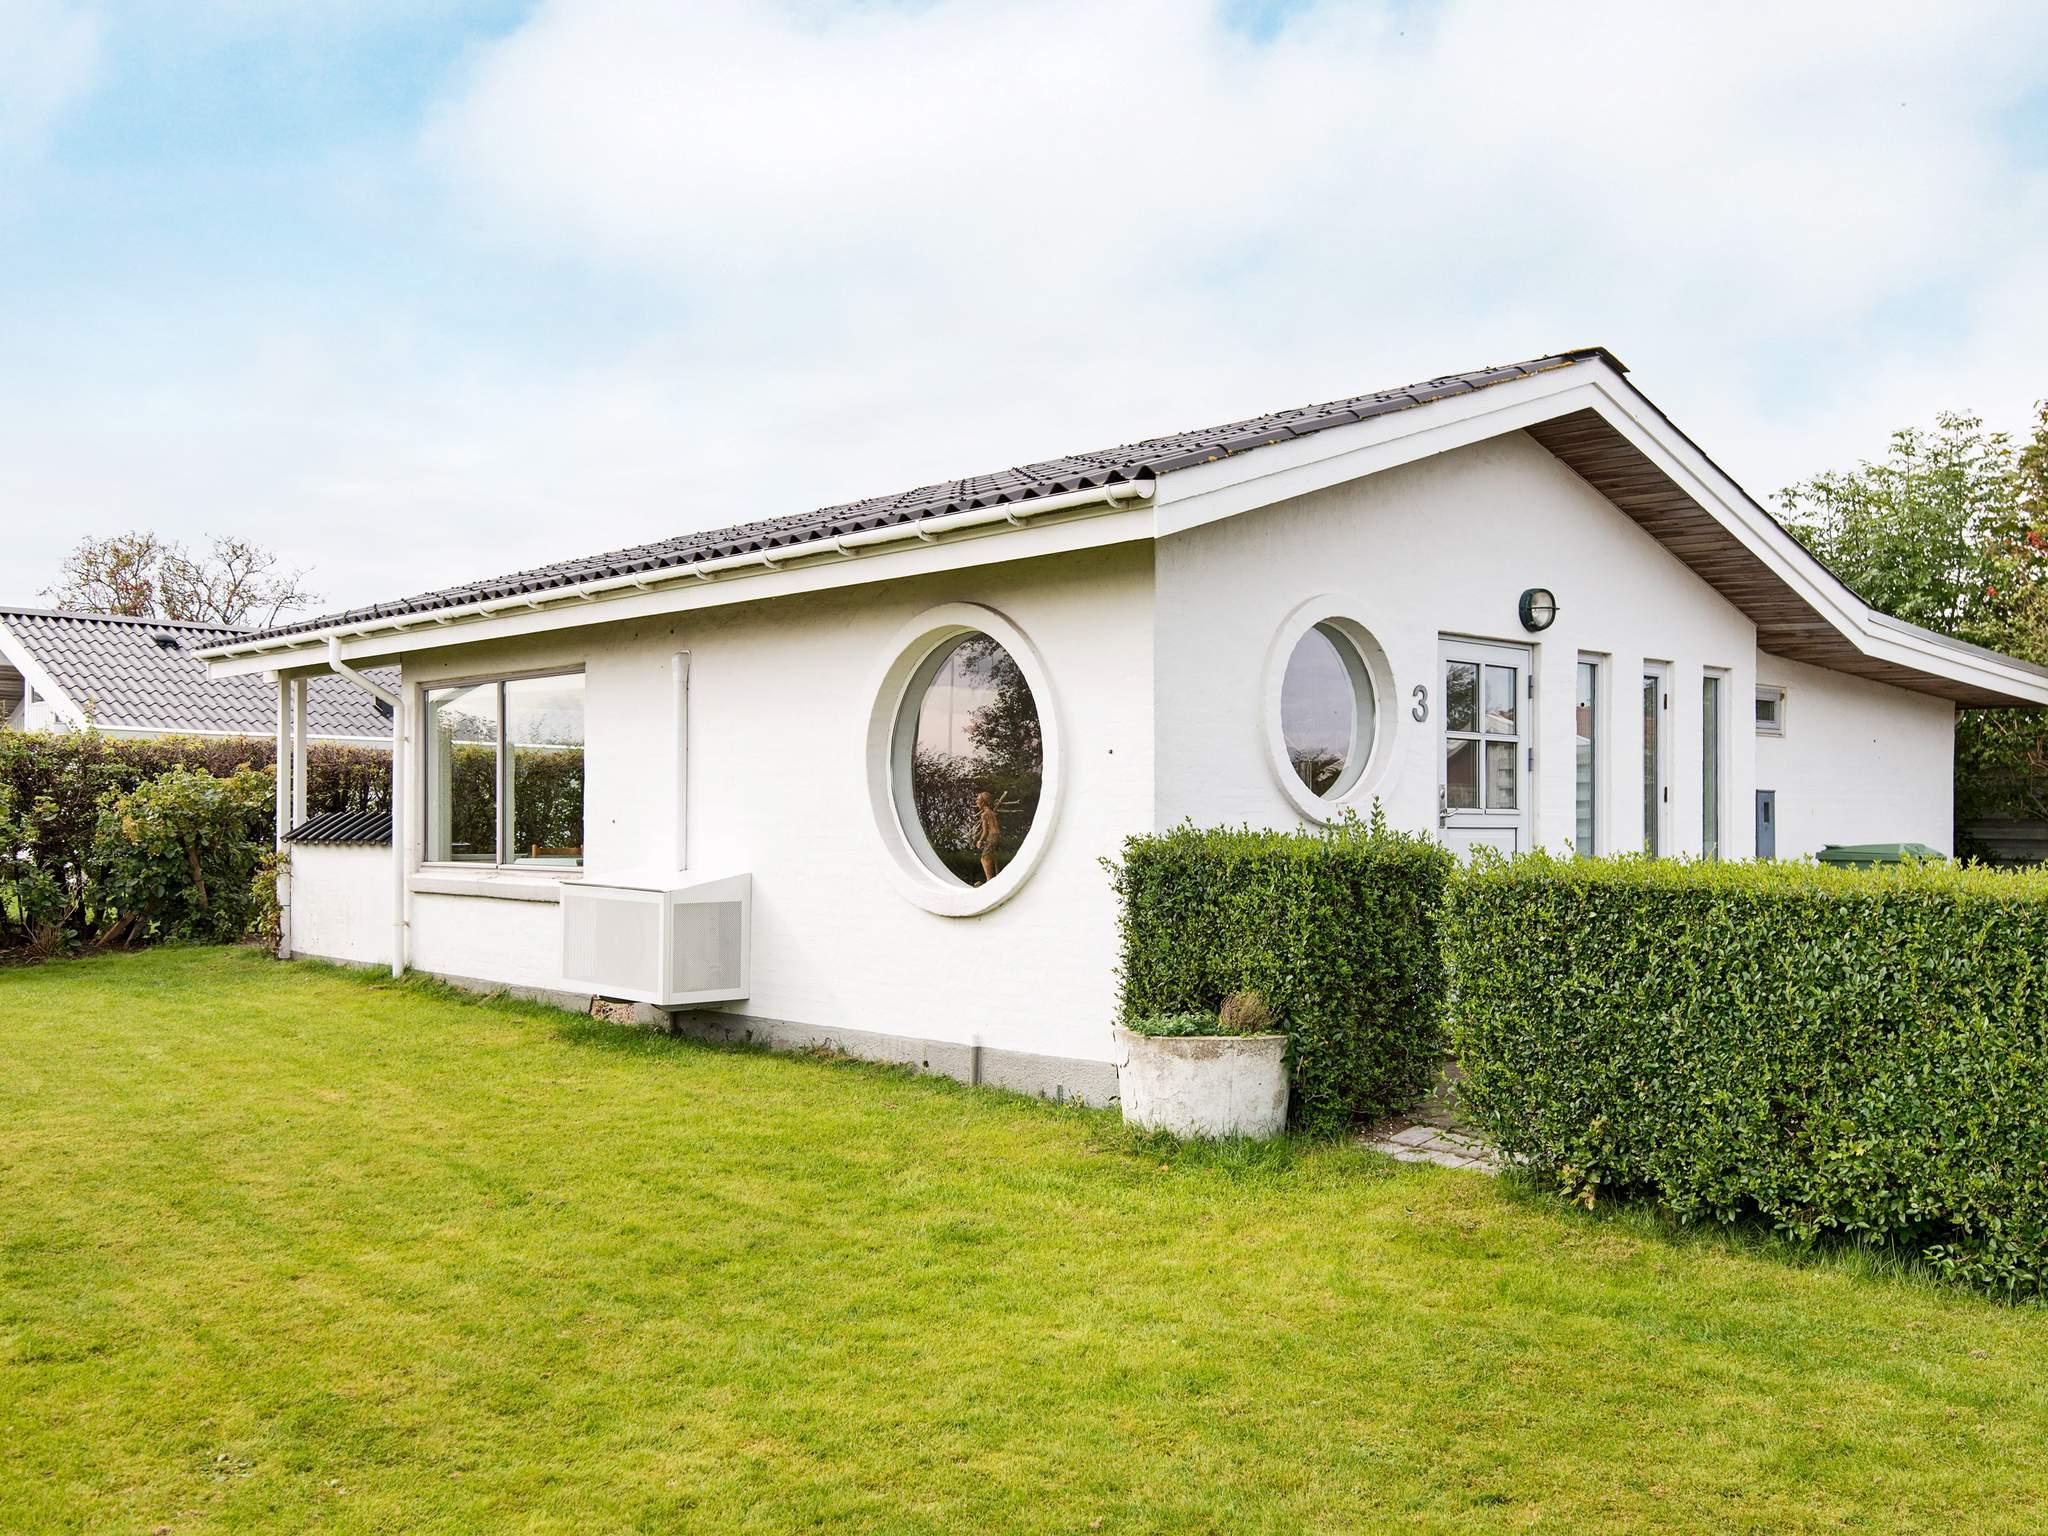 Ferienhaus Ajstrup Strand/Malling (2355032), Ajstrup, , Dänische Ostsee, Dänemark, Bild 15